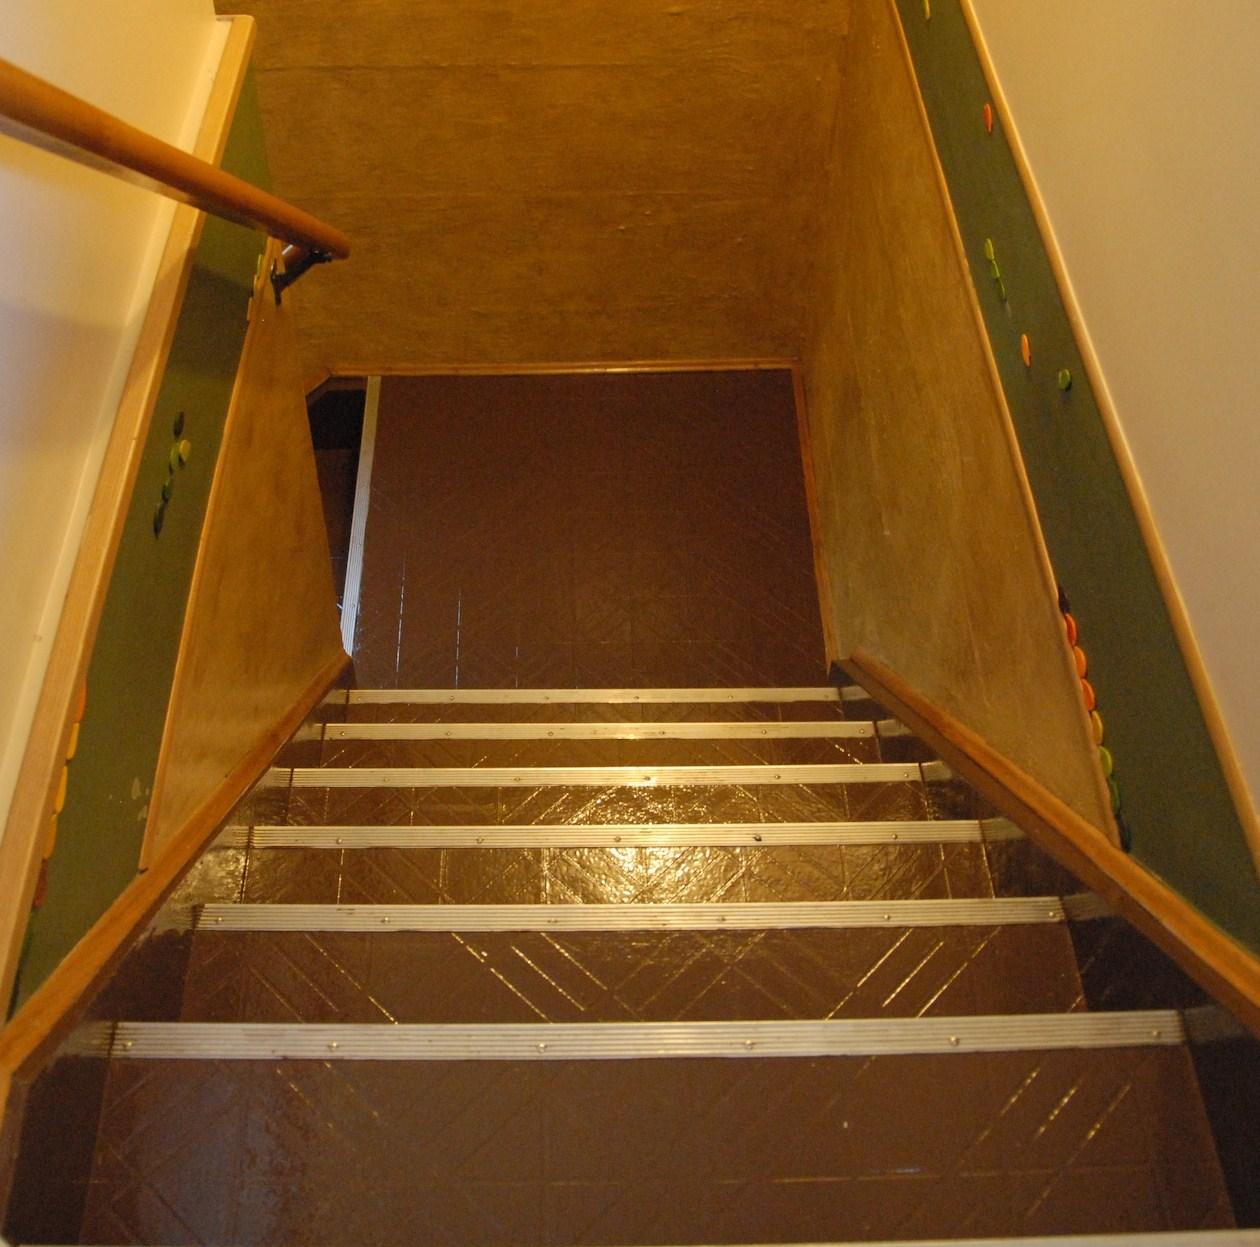 Painting linoleum floors serial room arranger for Can you paint linoleum floors